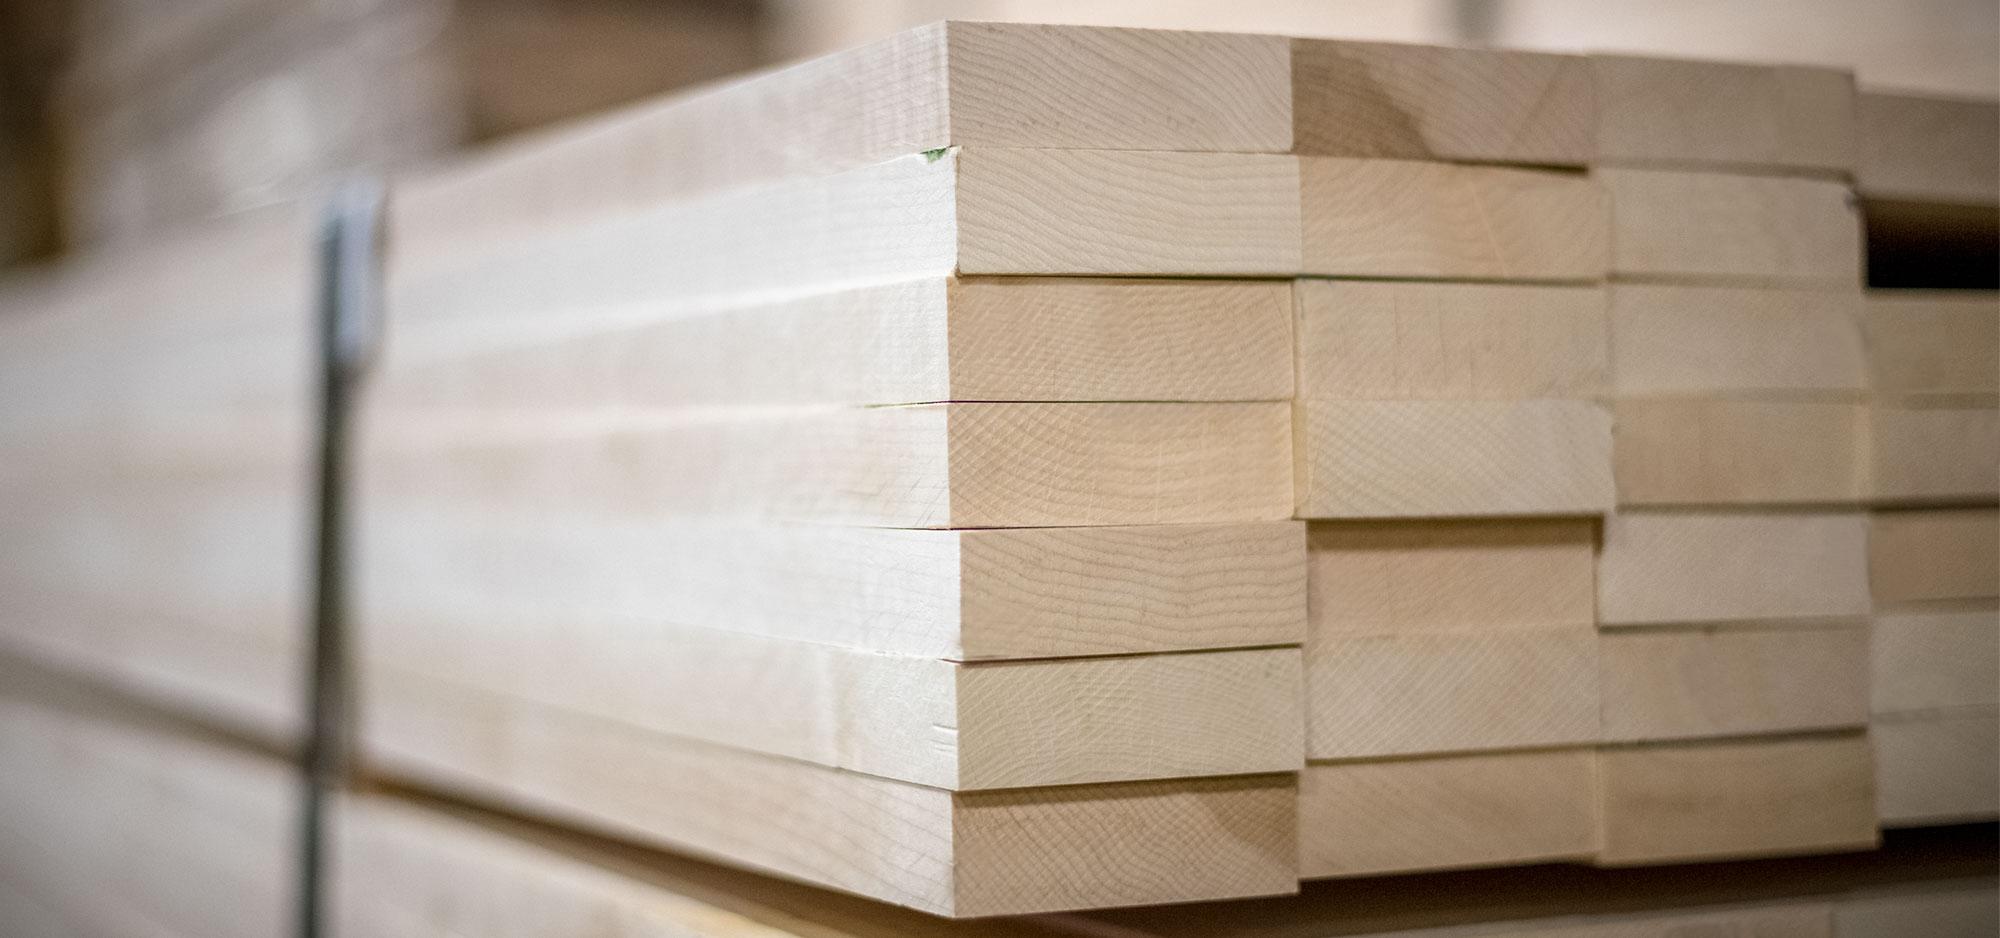 Hardwood Lumber From Baillie Baillie Lumber Hardwood